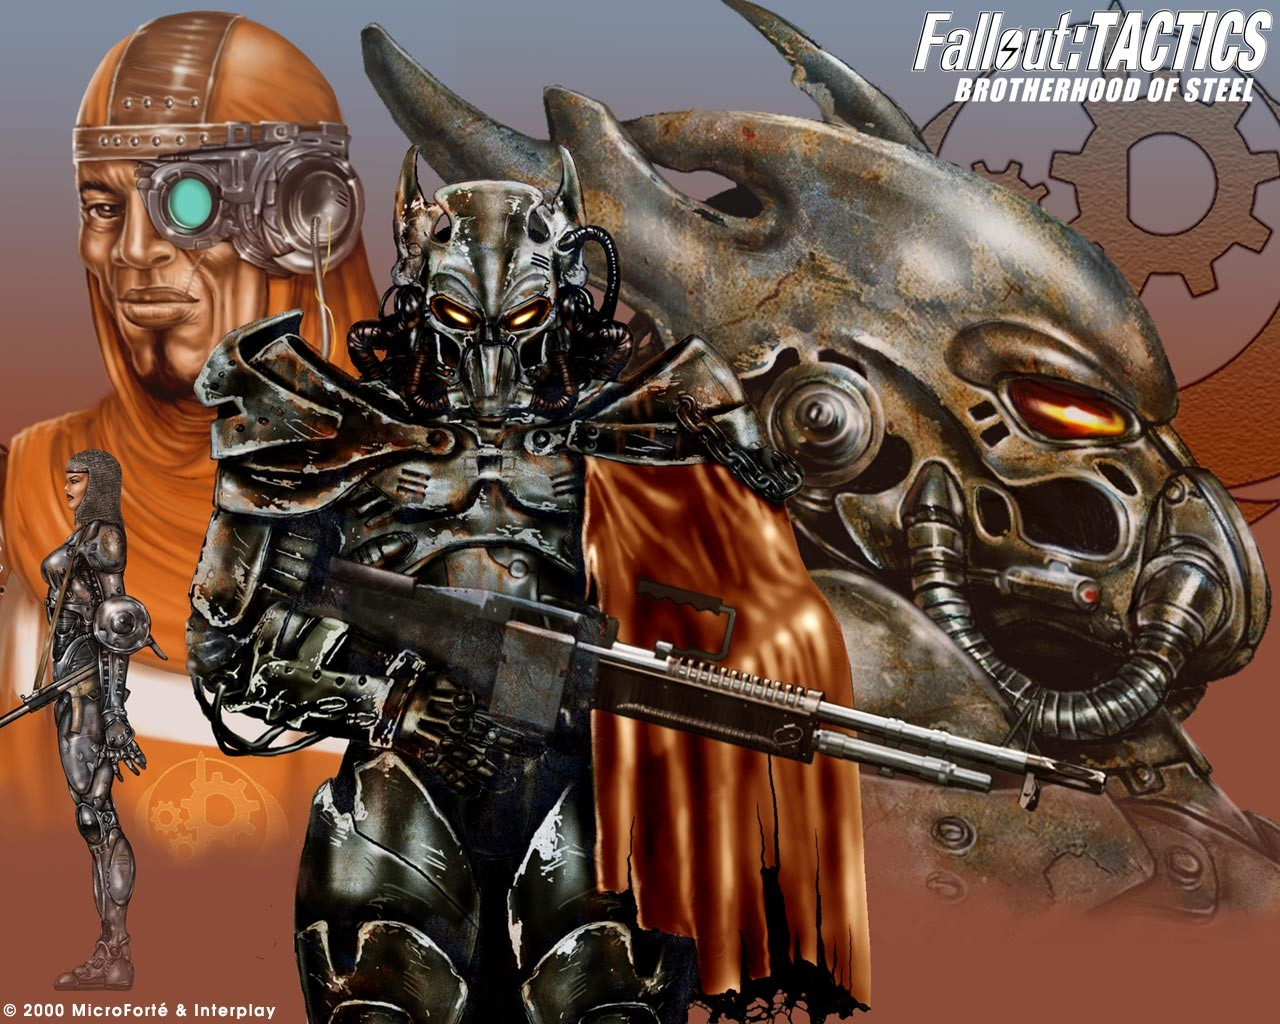 Fallout 3 porn machinima sexual photos